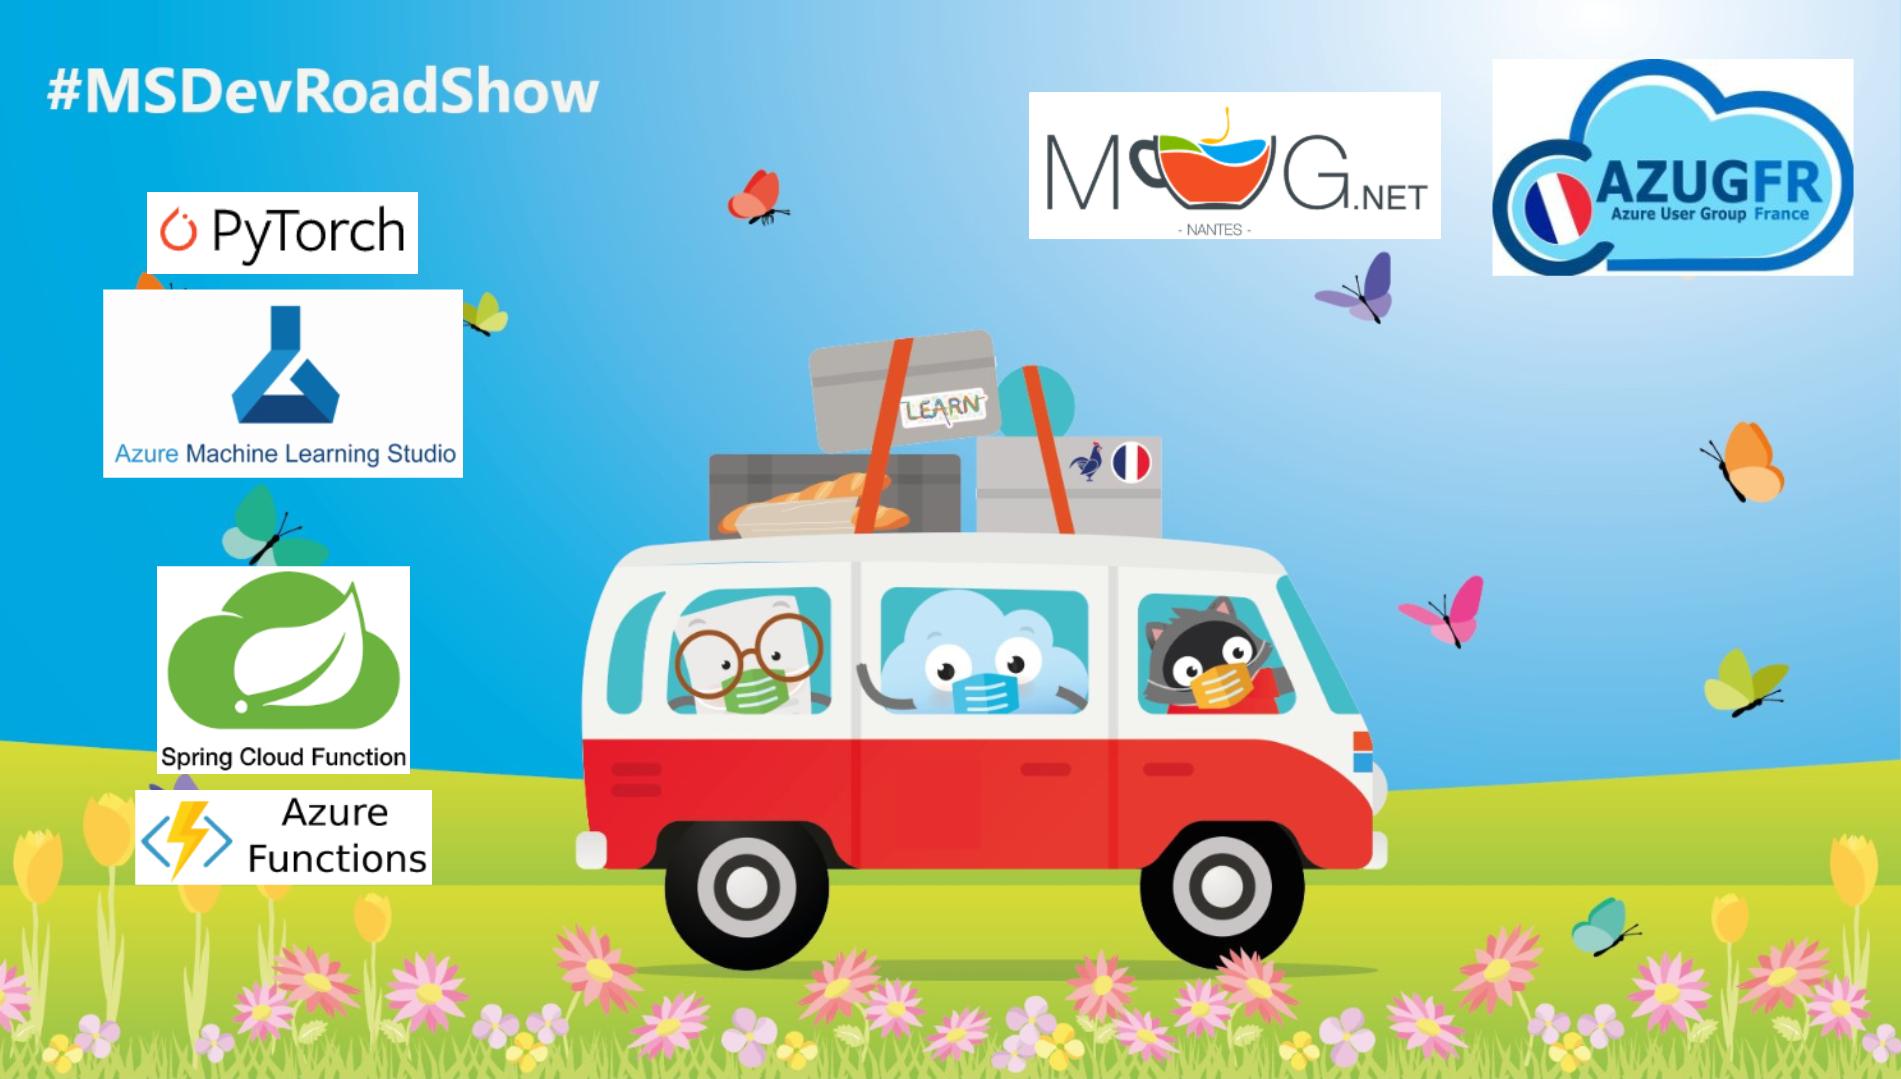 msdev withlogos - MSDevRoadShow : Back to Nantes !